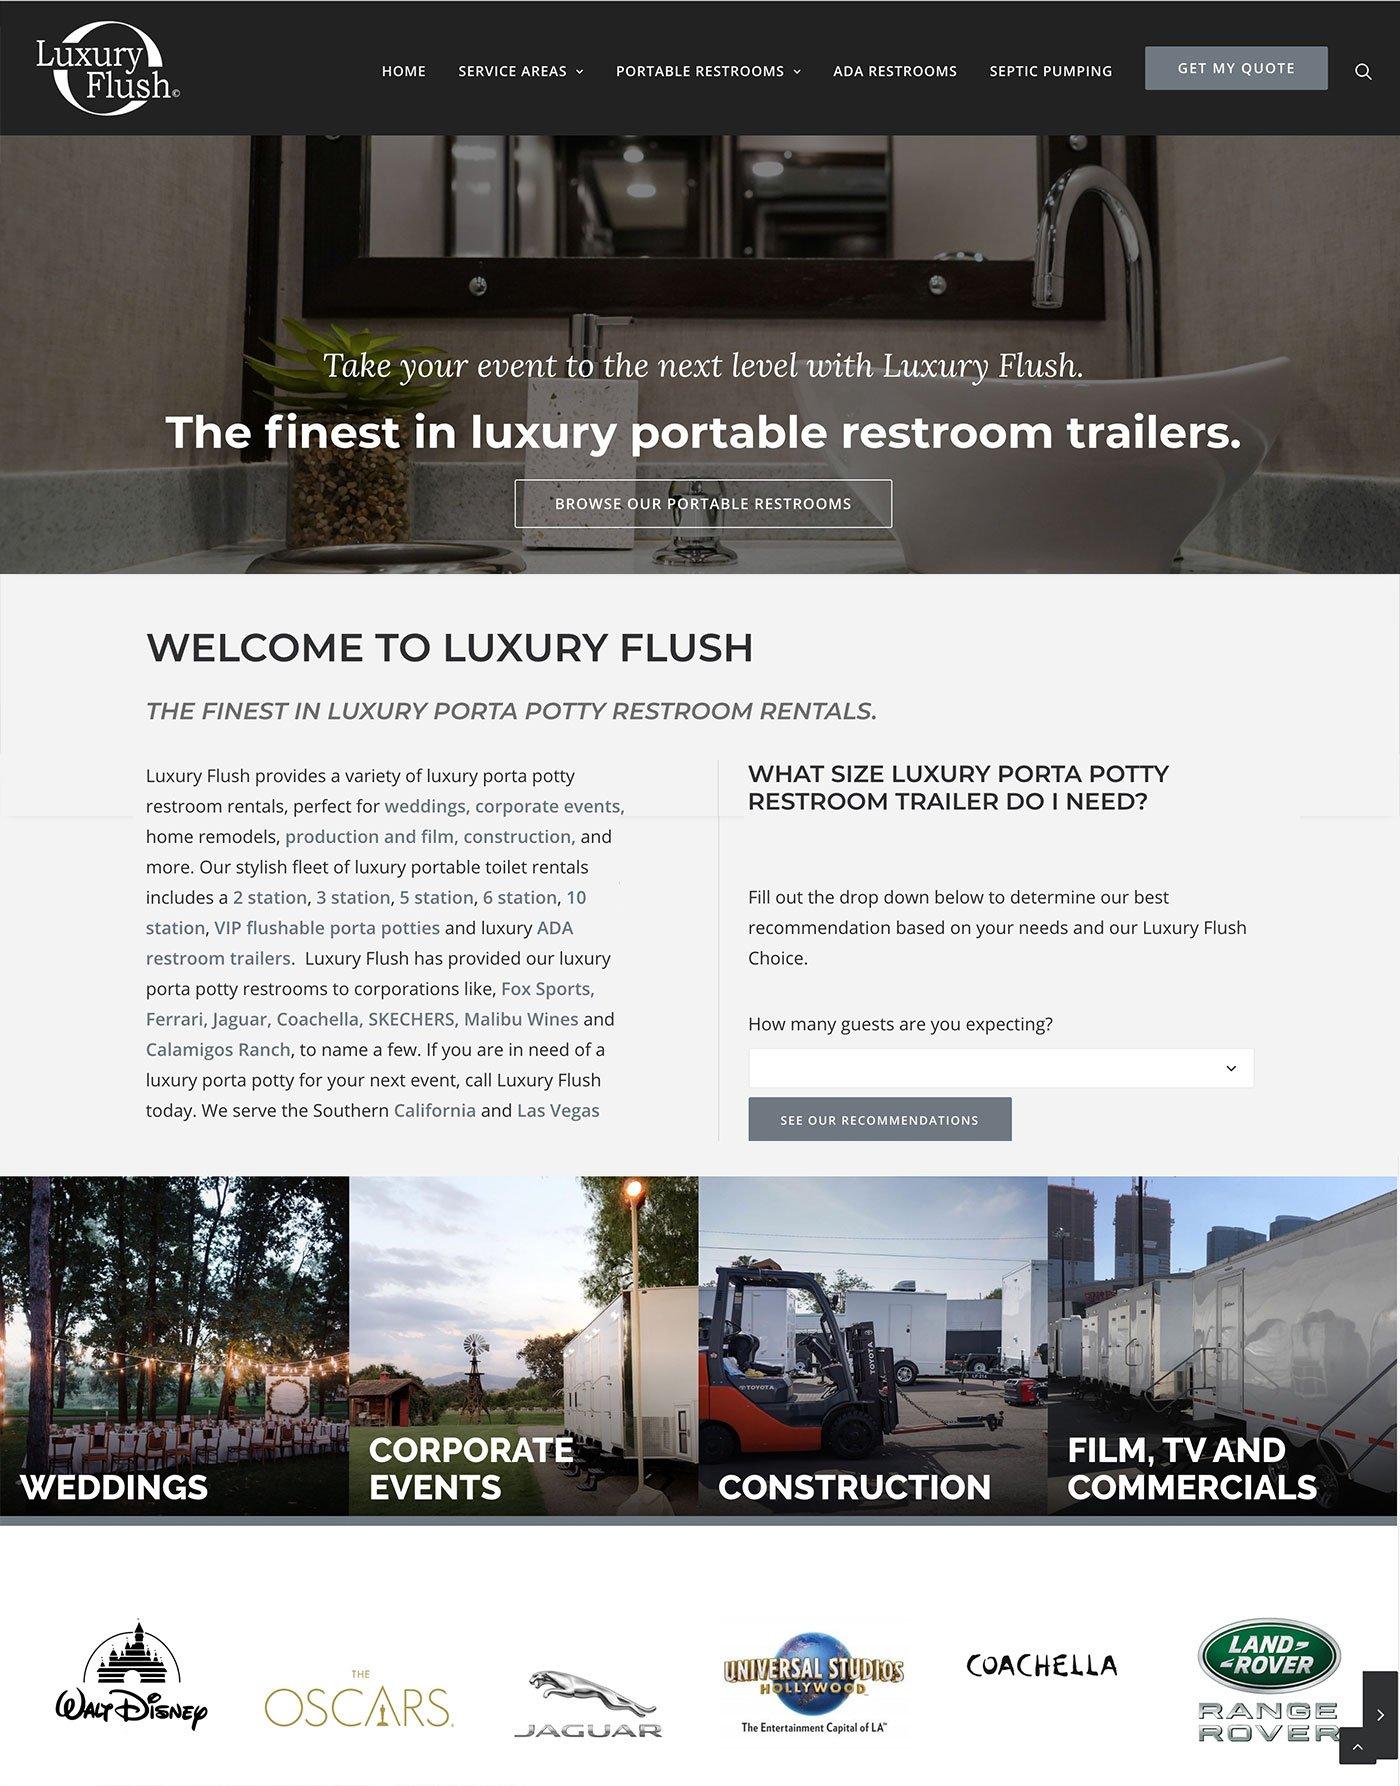 luxury Flush homepage